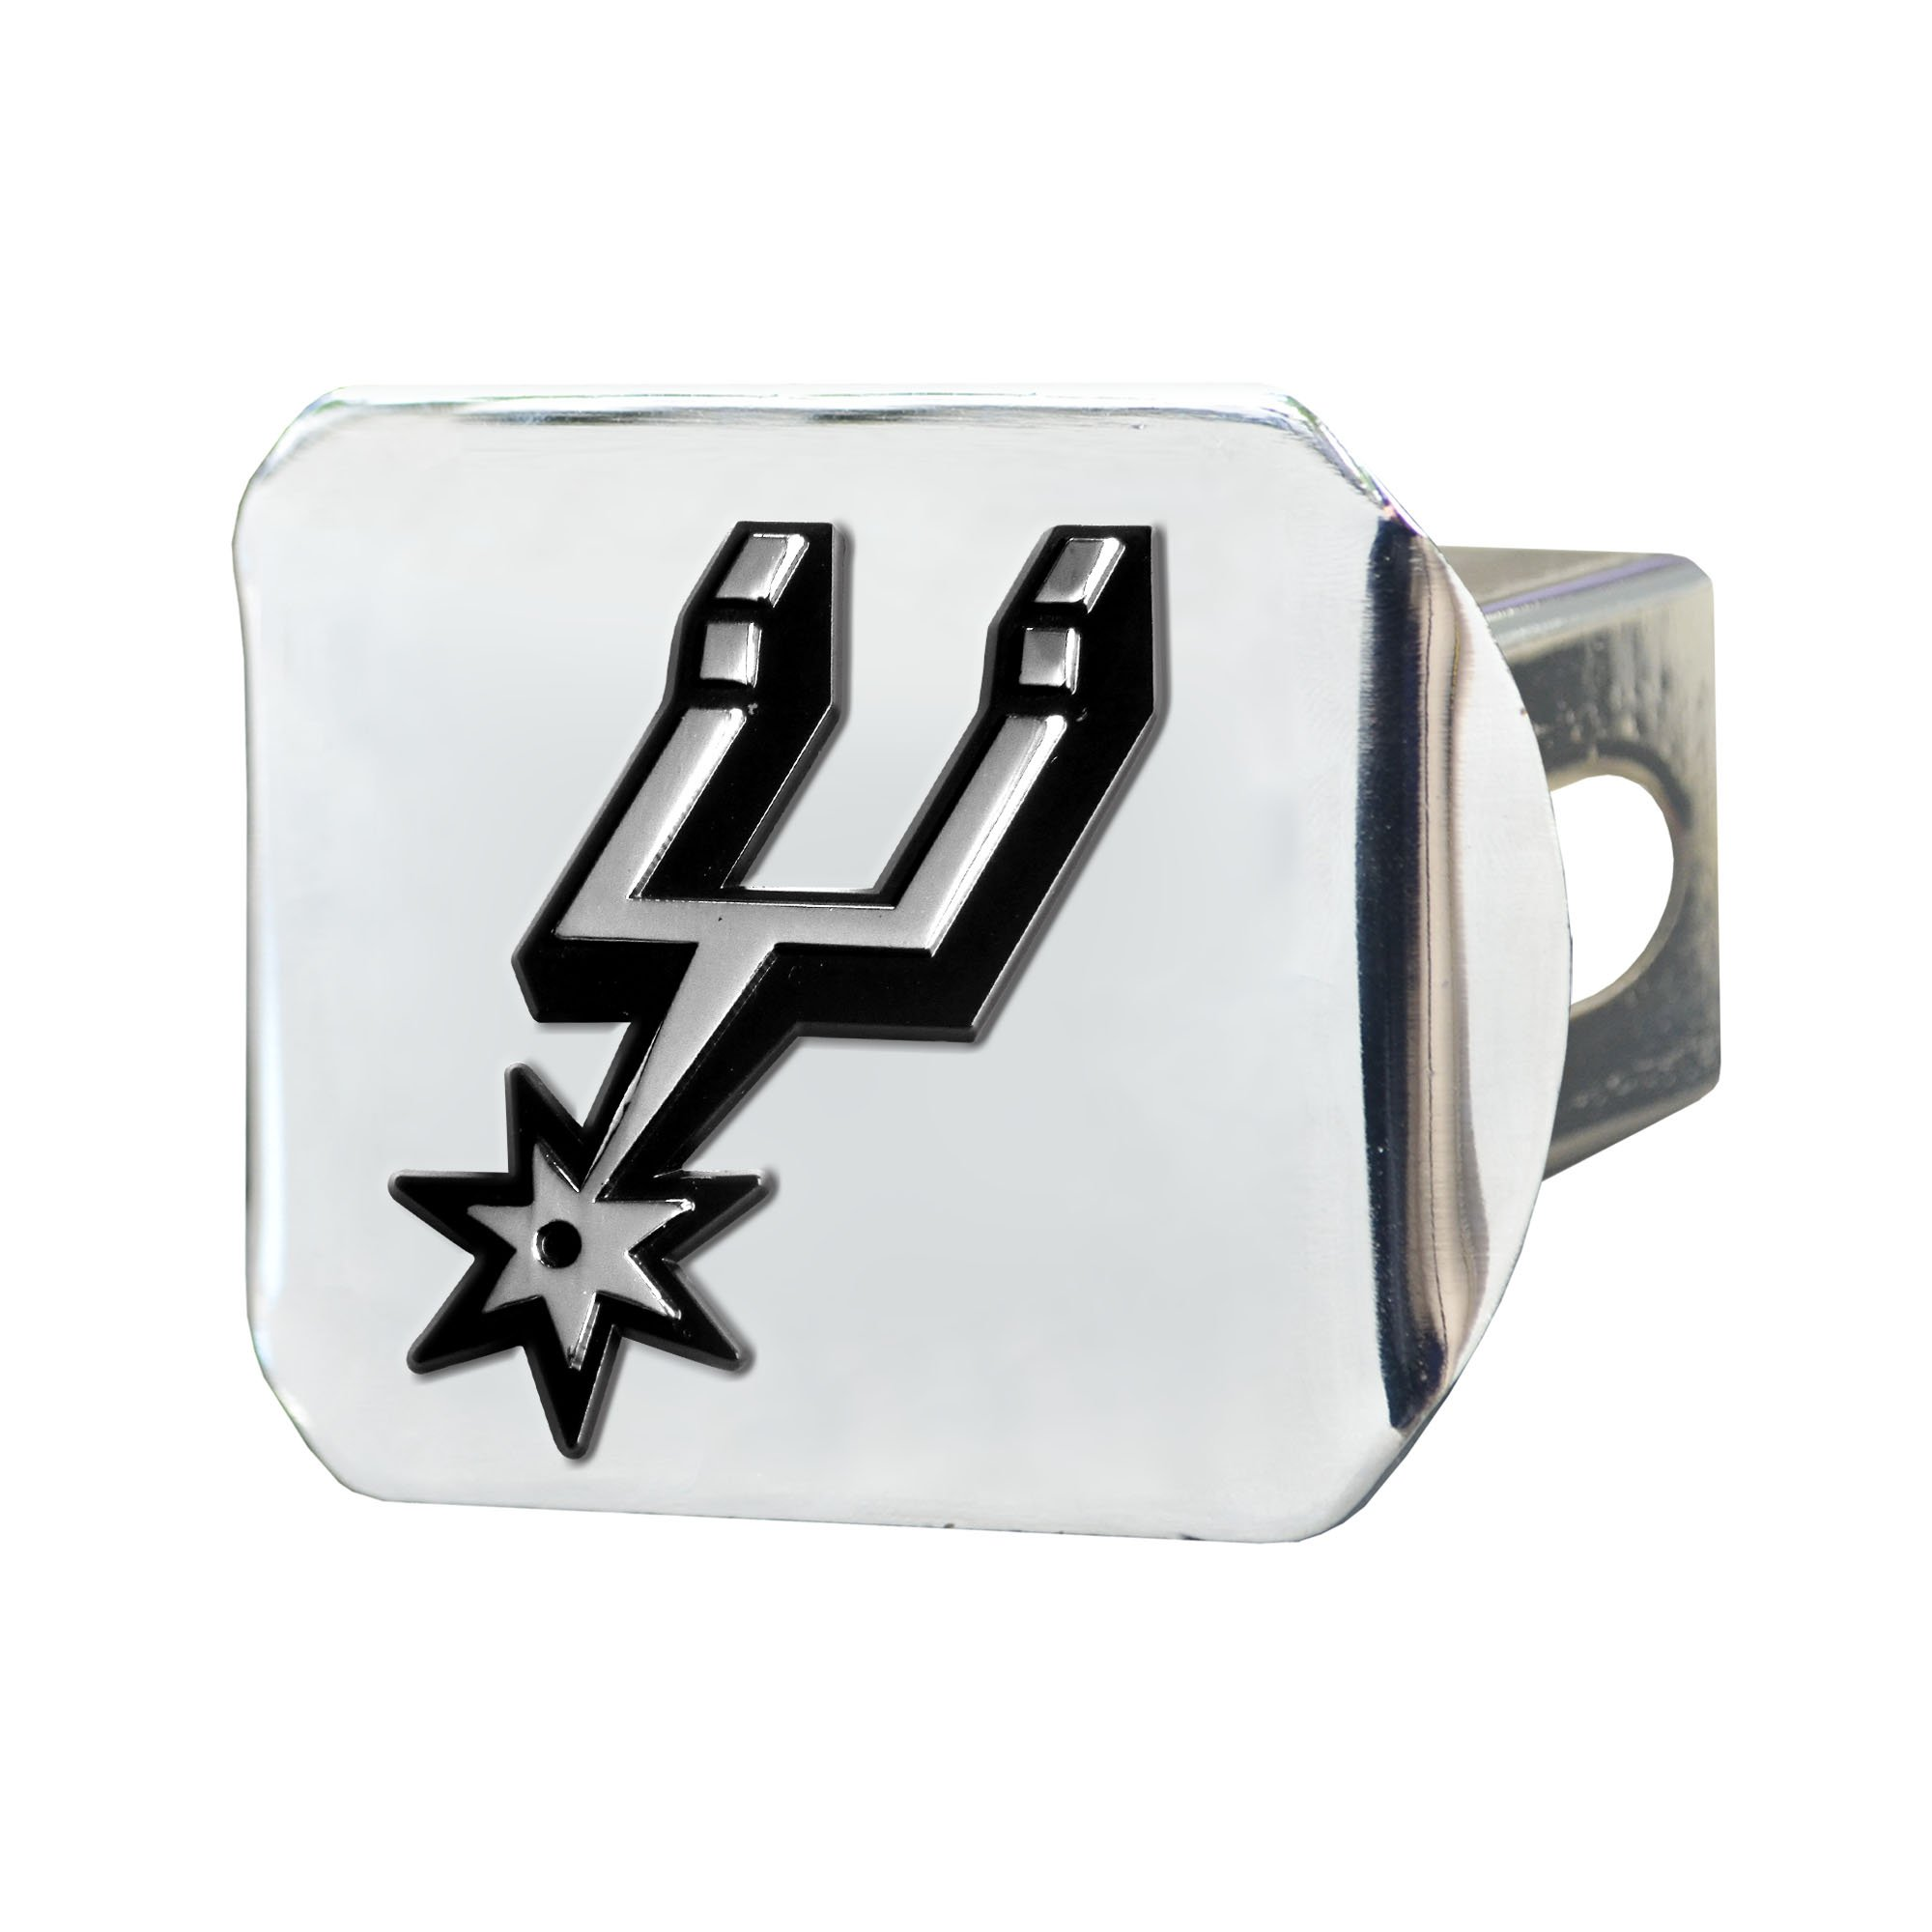 Fanmats NBA San Antonio Spurs Chrome Hitch Cover